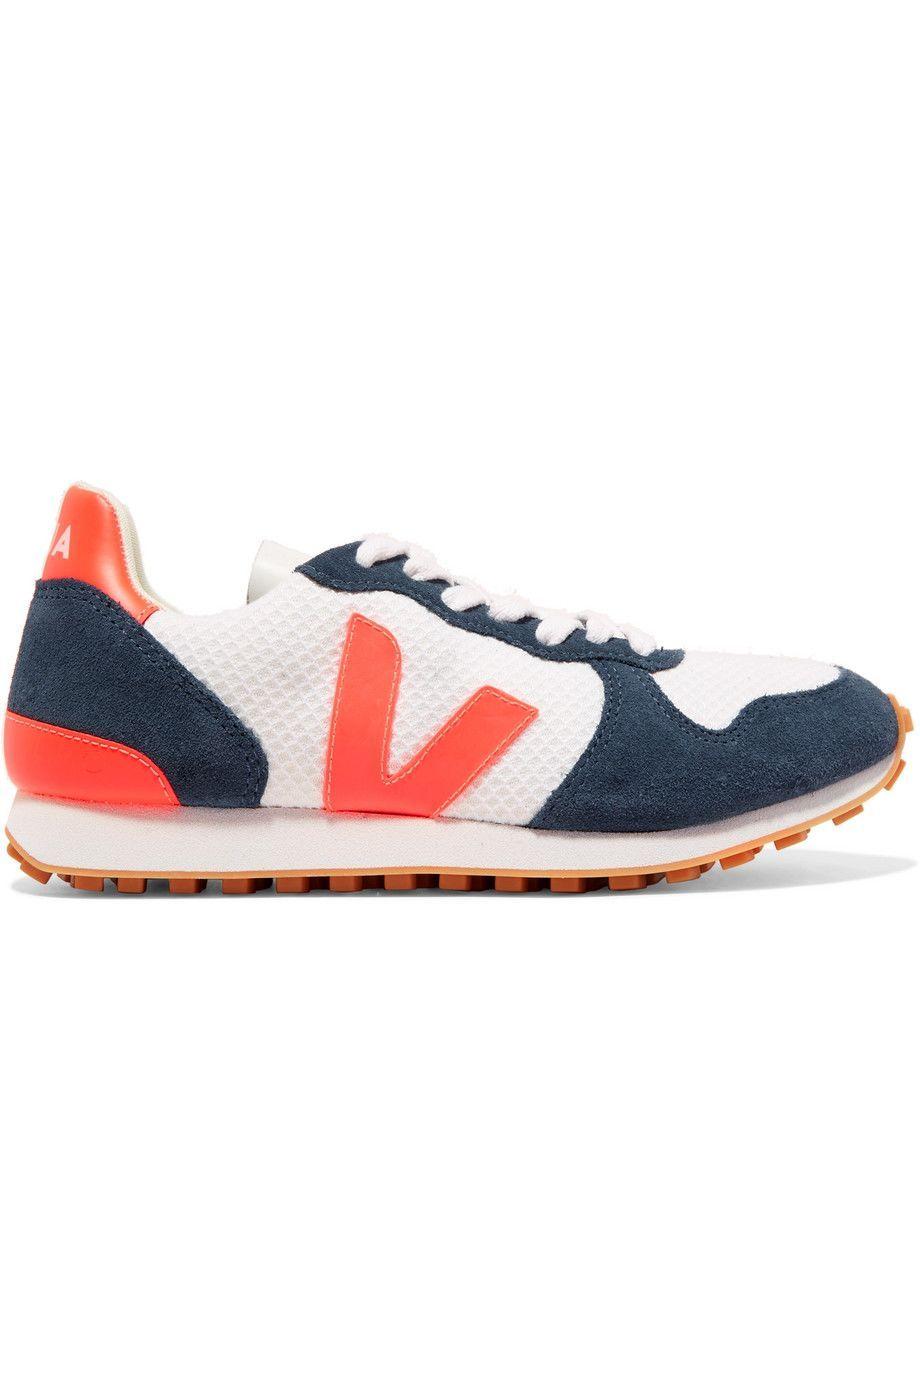 #PopbelaOOTD: Super Easy Chic Sneakers